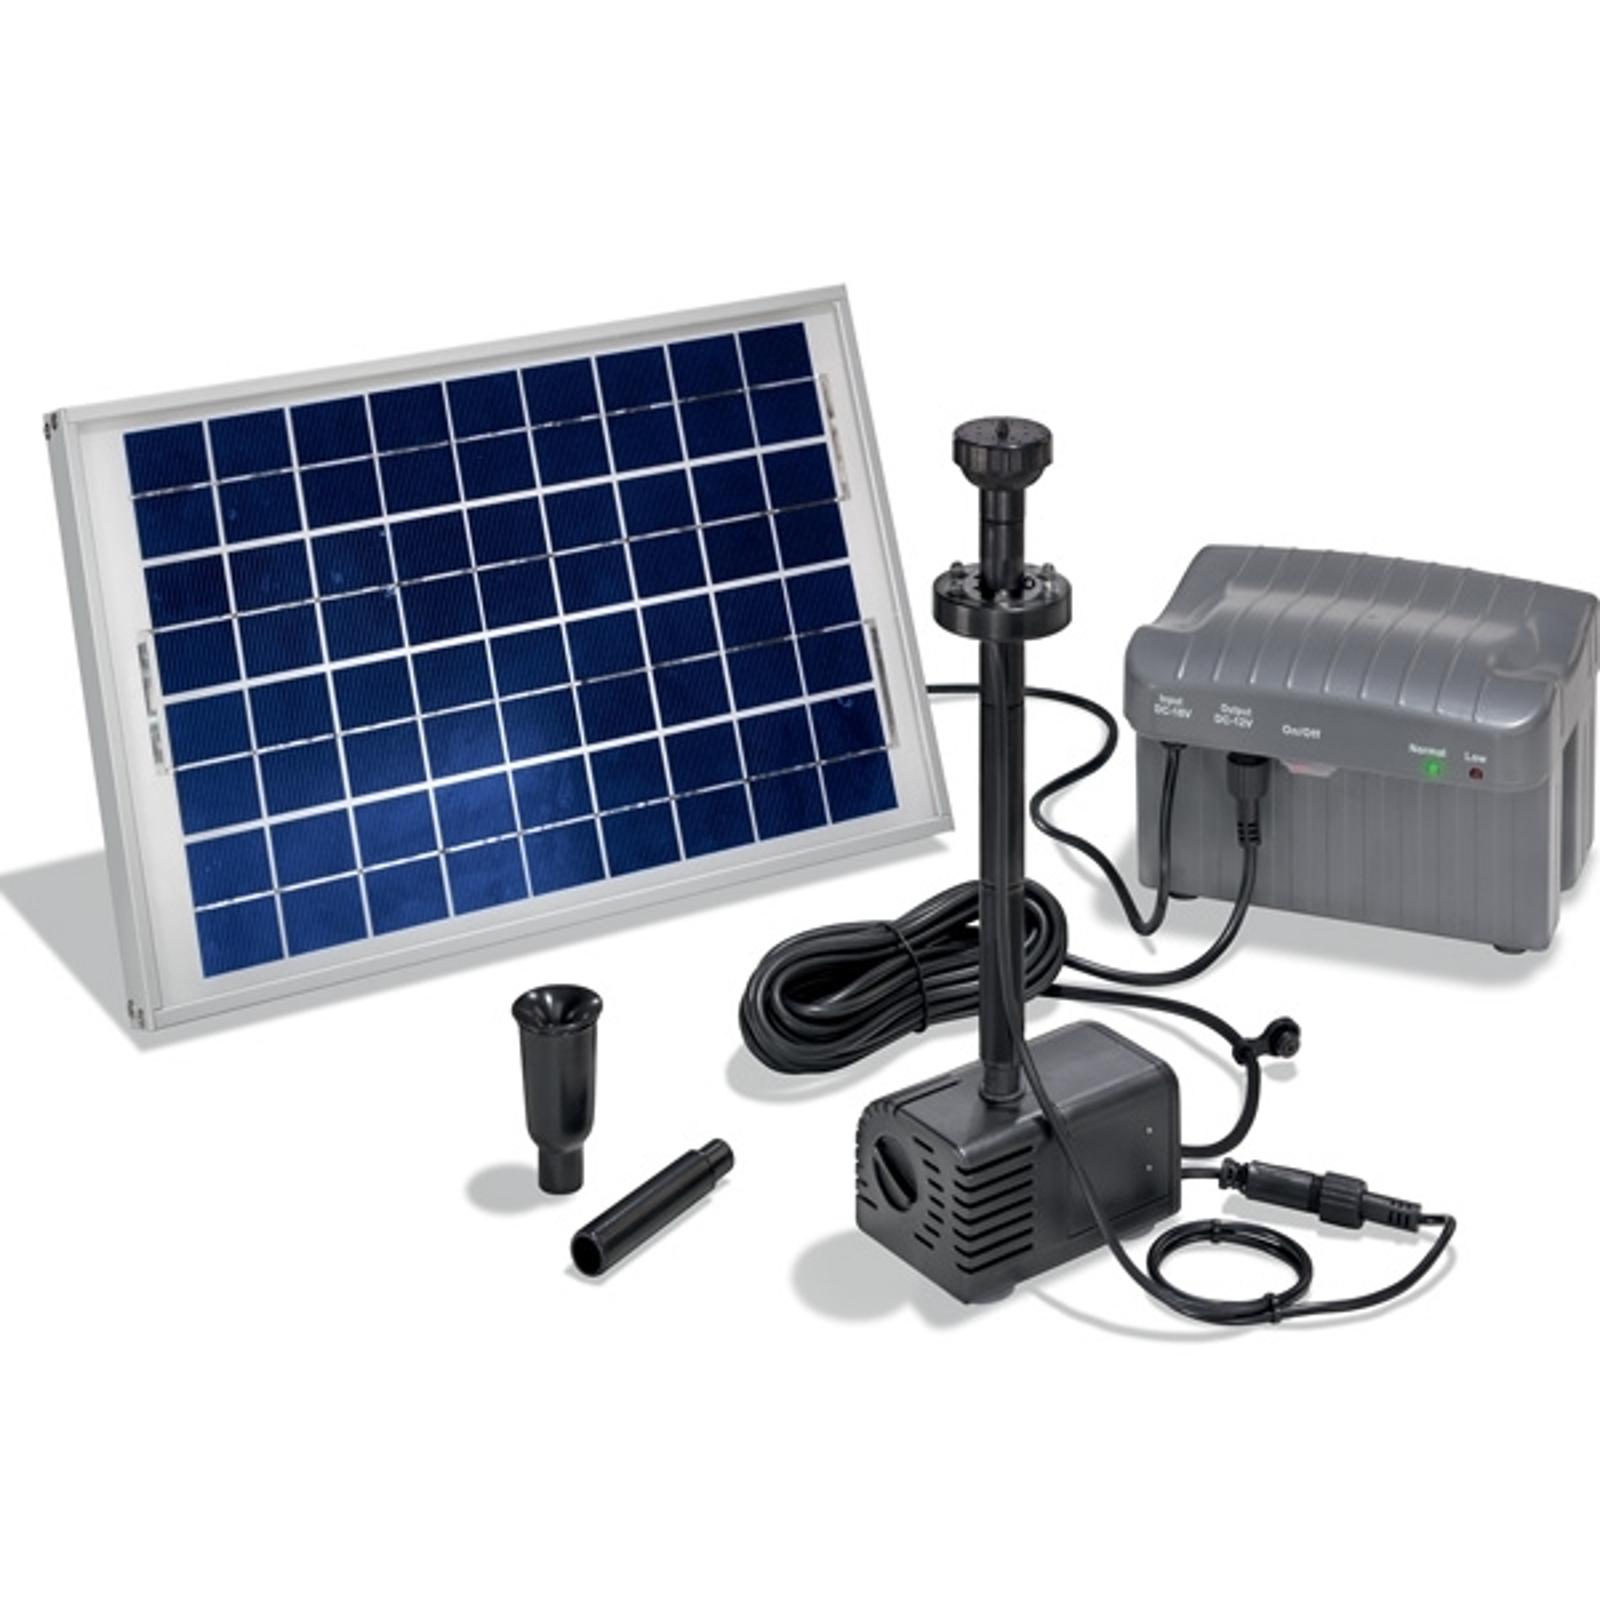 Solarny system pomp Siena z LED